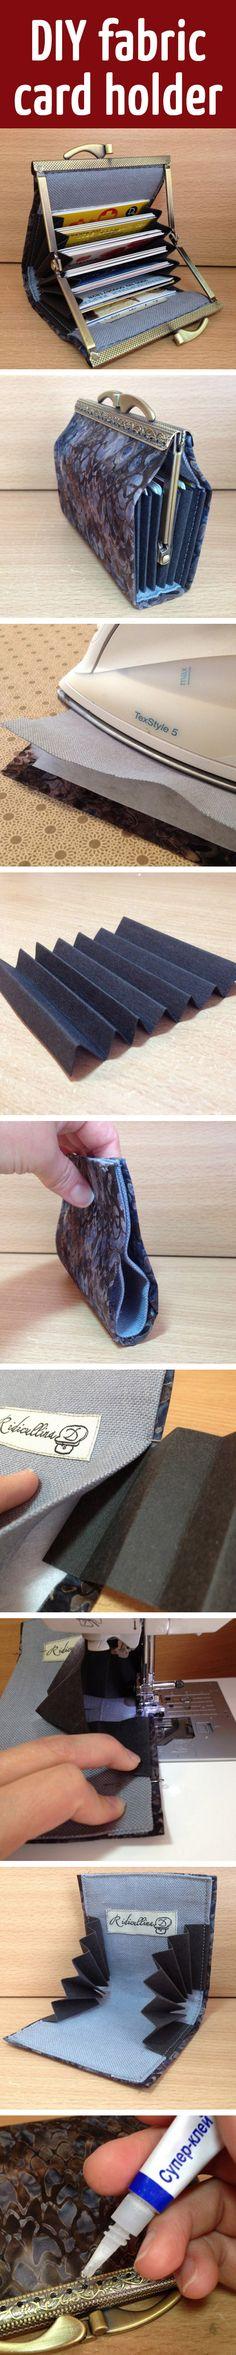 DIY fabric card holder